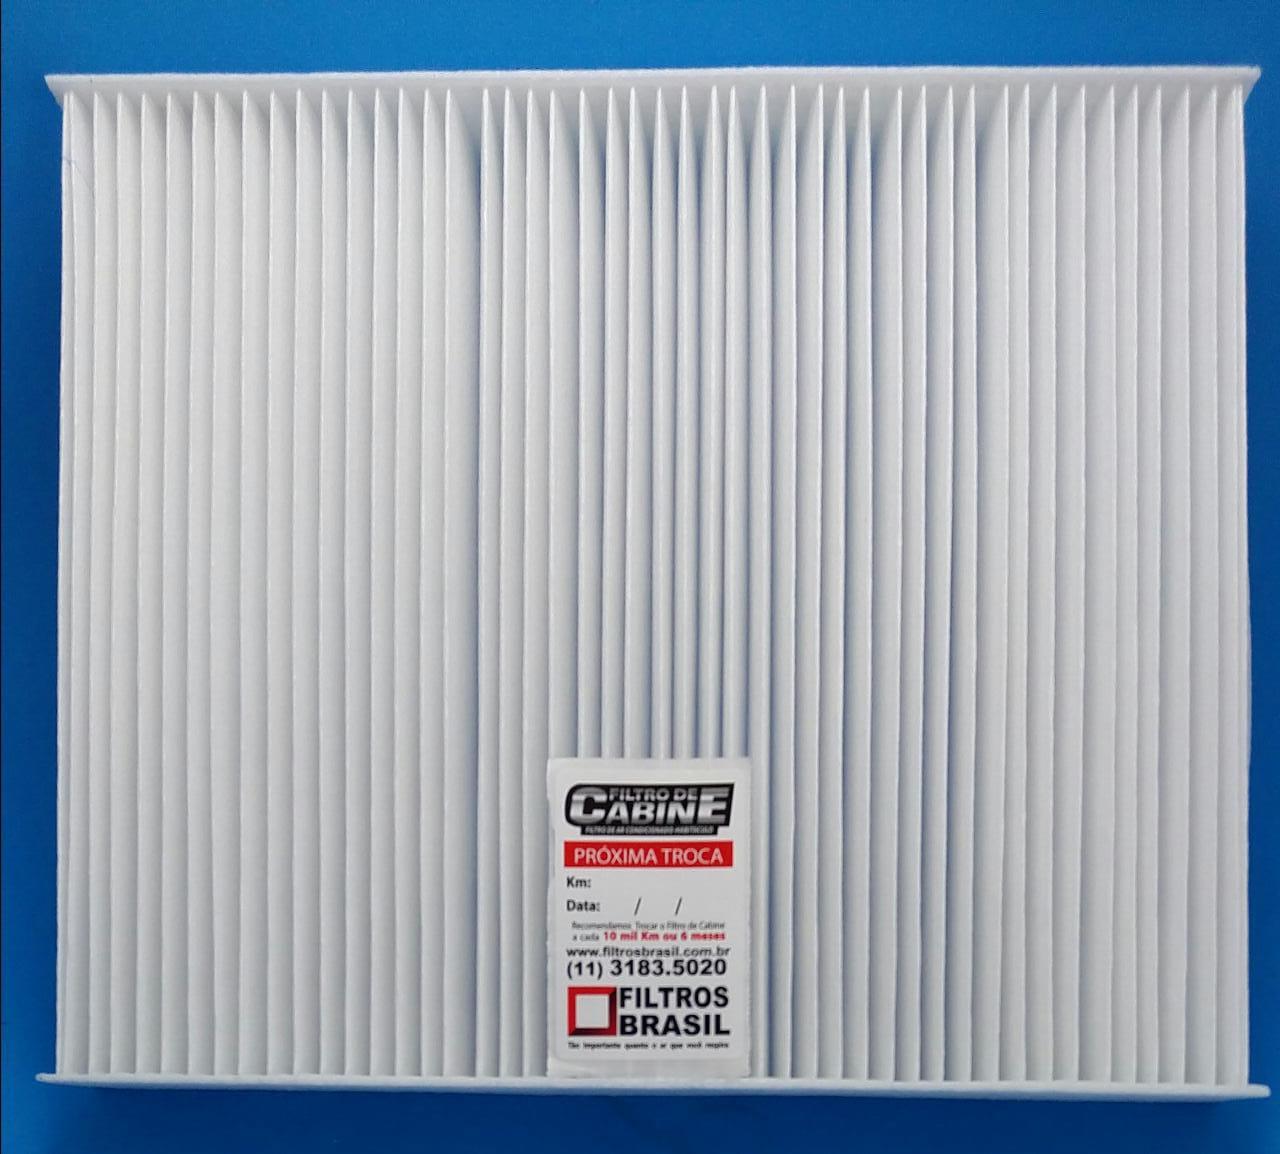 Filtro Cabine-Onix-Cobalt-Spin-Sonic-Cruze11/16-Prisma 13/16-FB1081